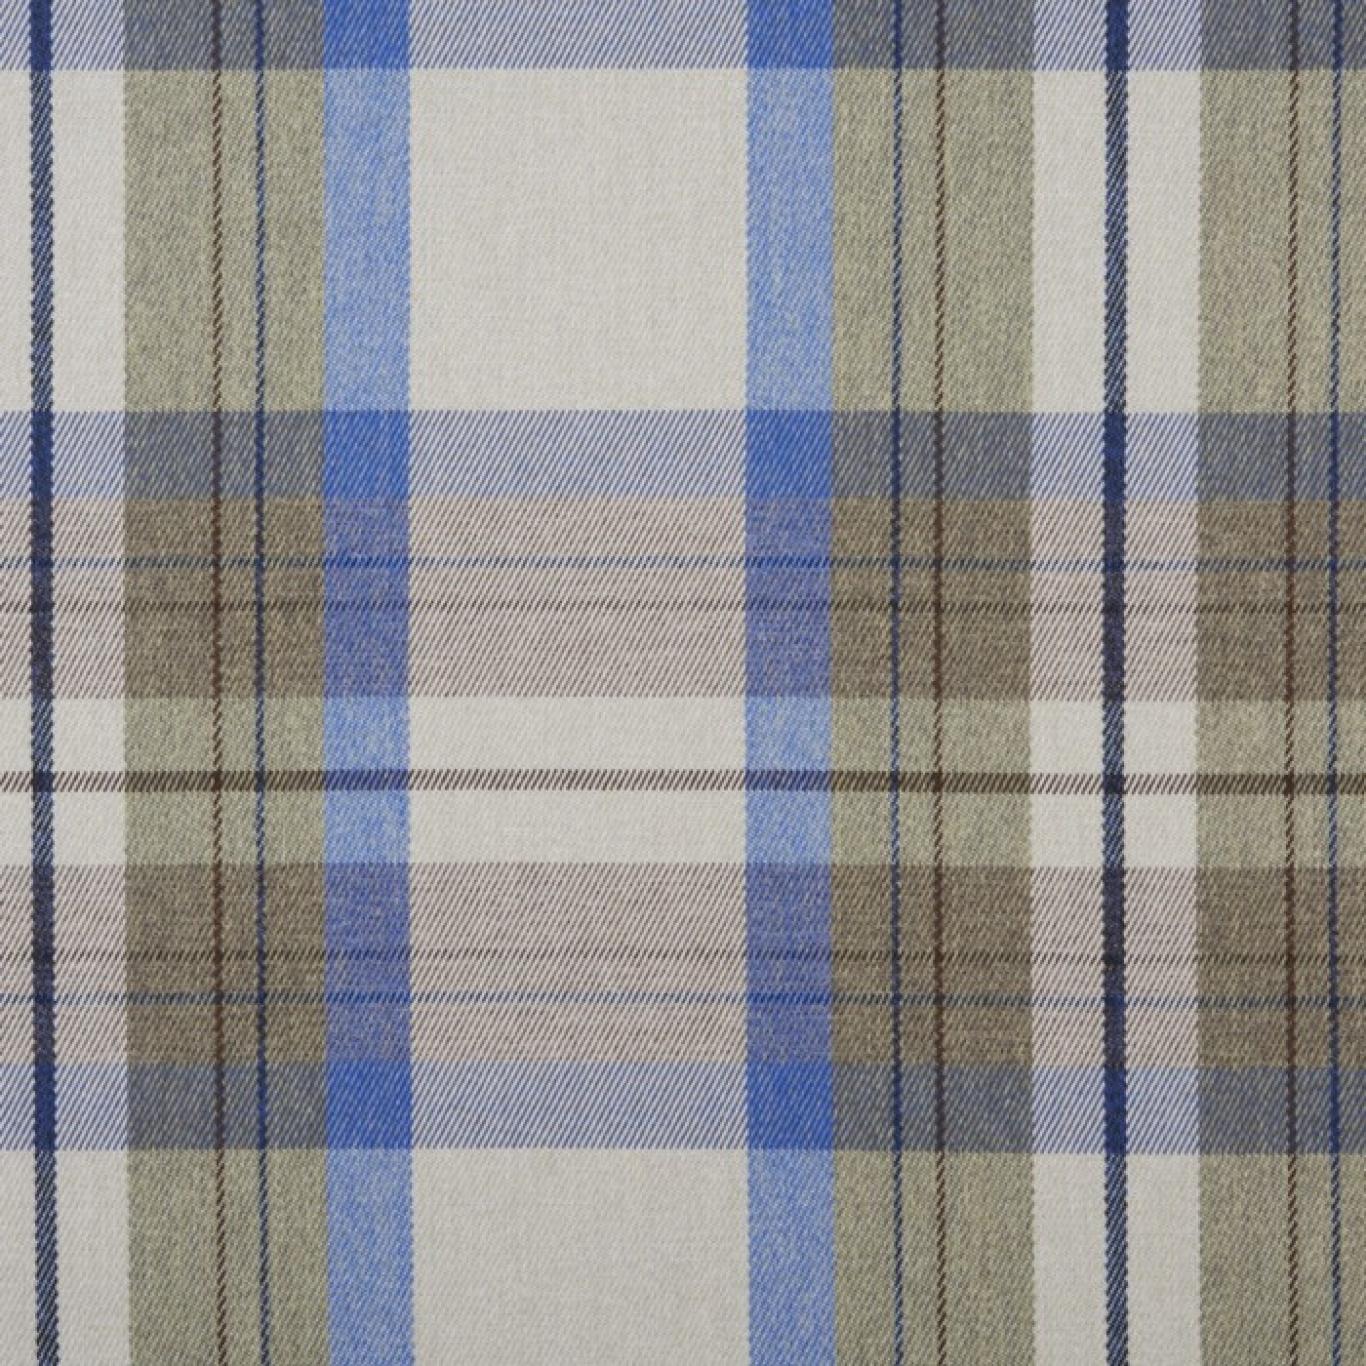 Image of Prestigious Cairngorm Loch Fabric